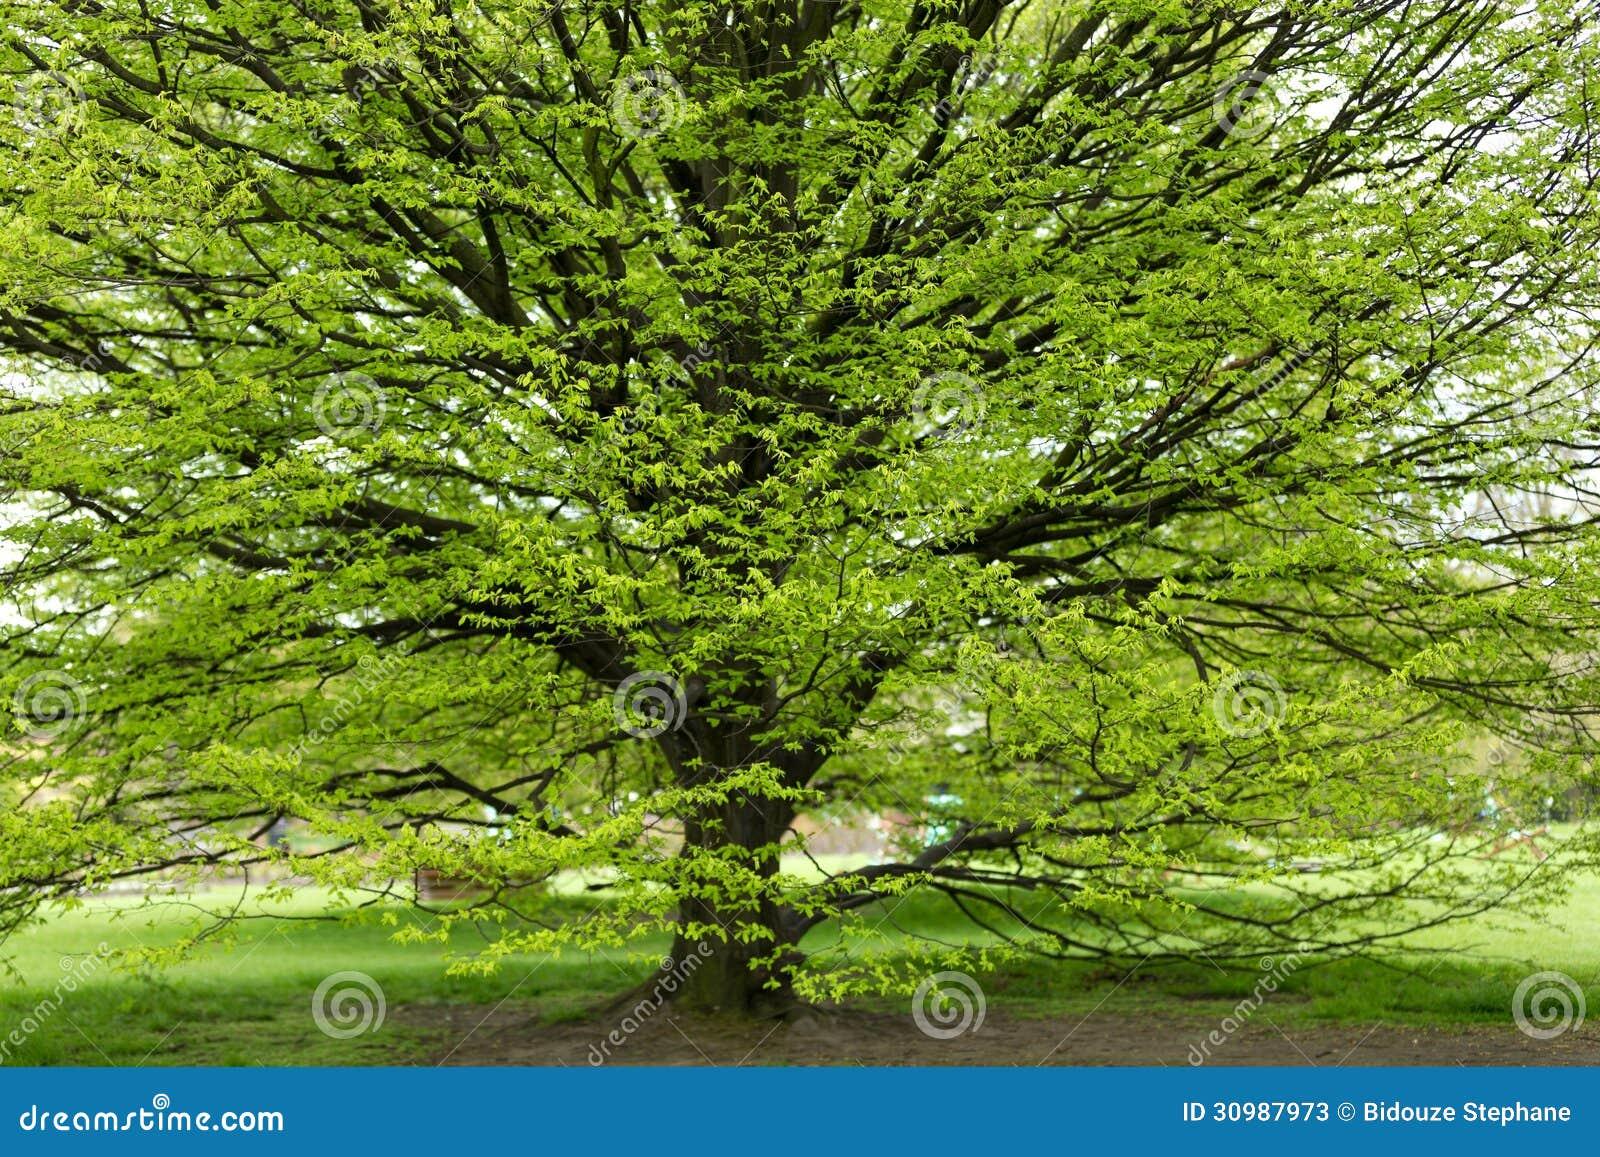 hornbeam tree at spring stock photos image 30987973. Black Bedroom Furniture Sets. Home Design Ideas